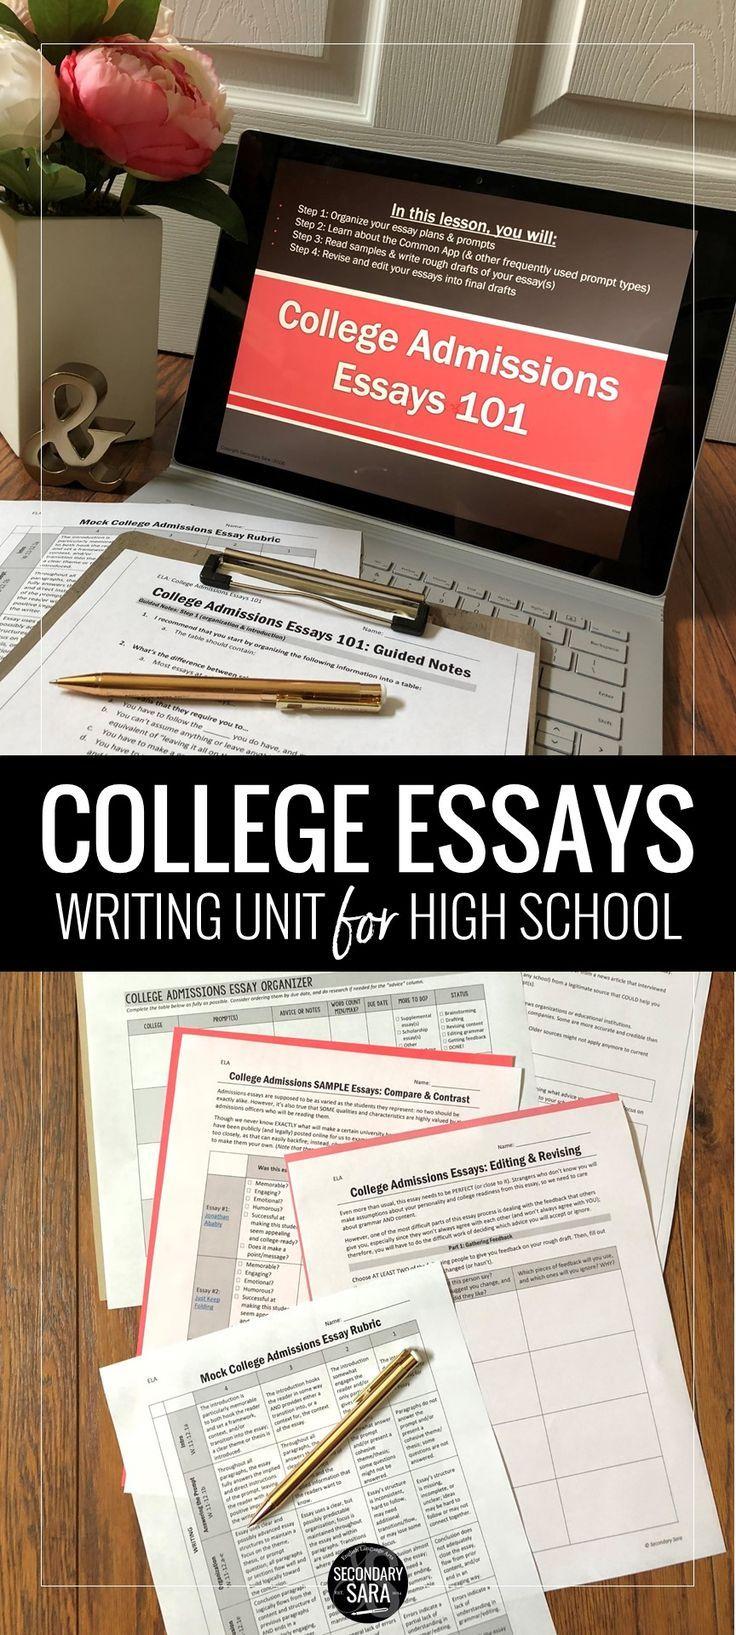 coalition application essay word limit